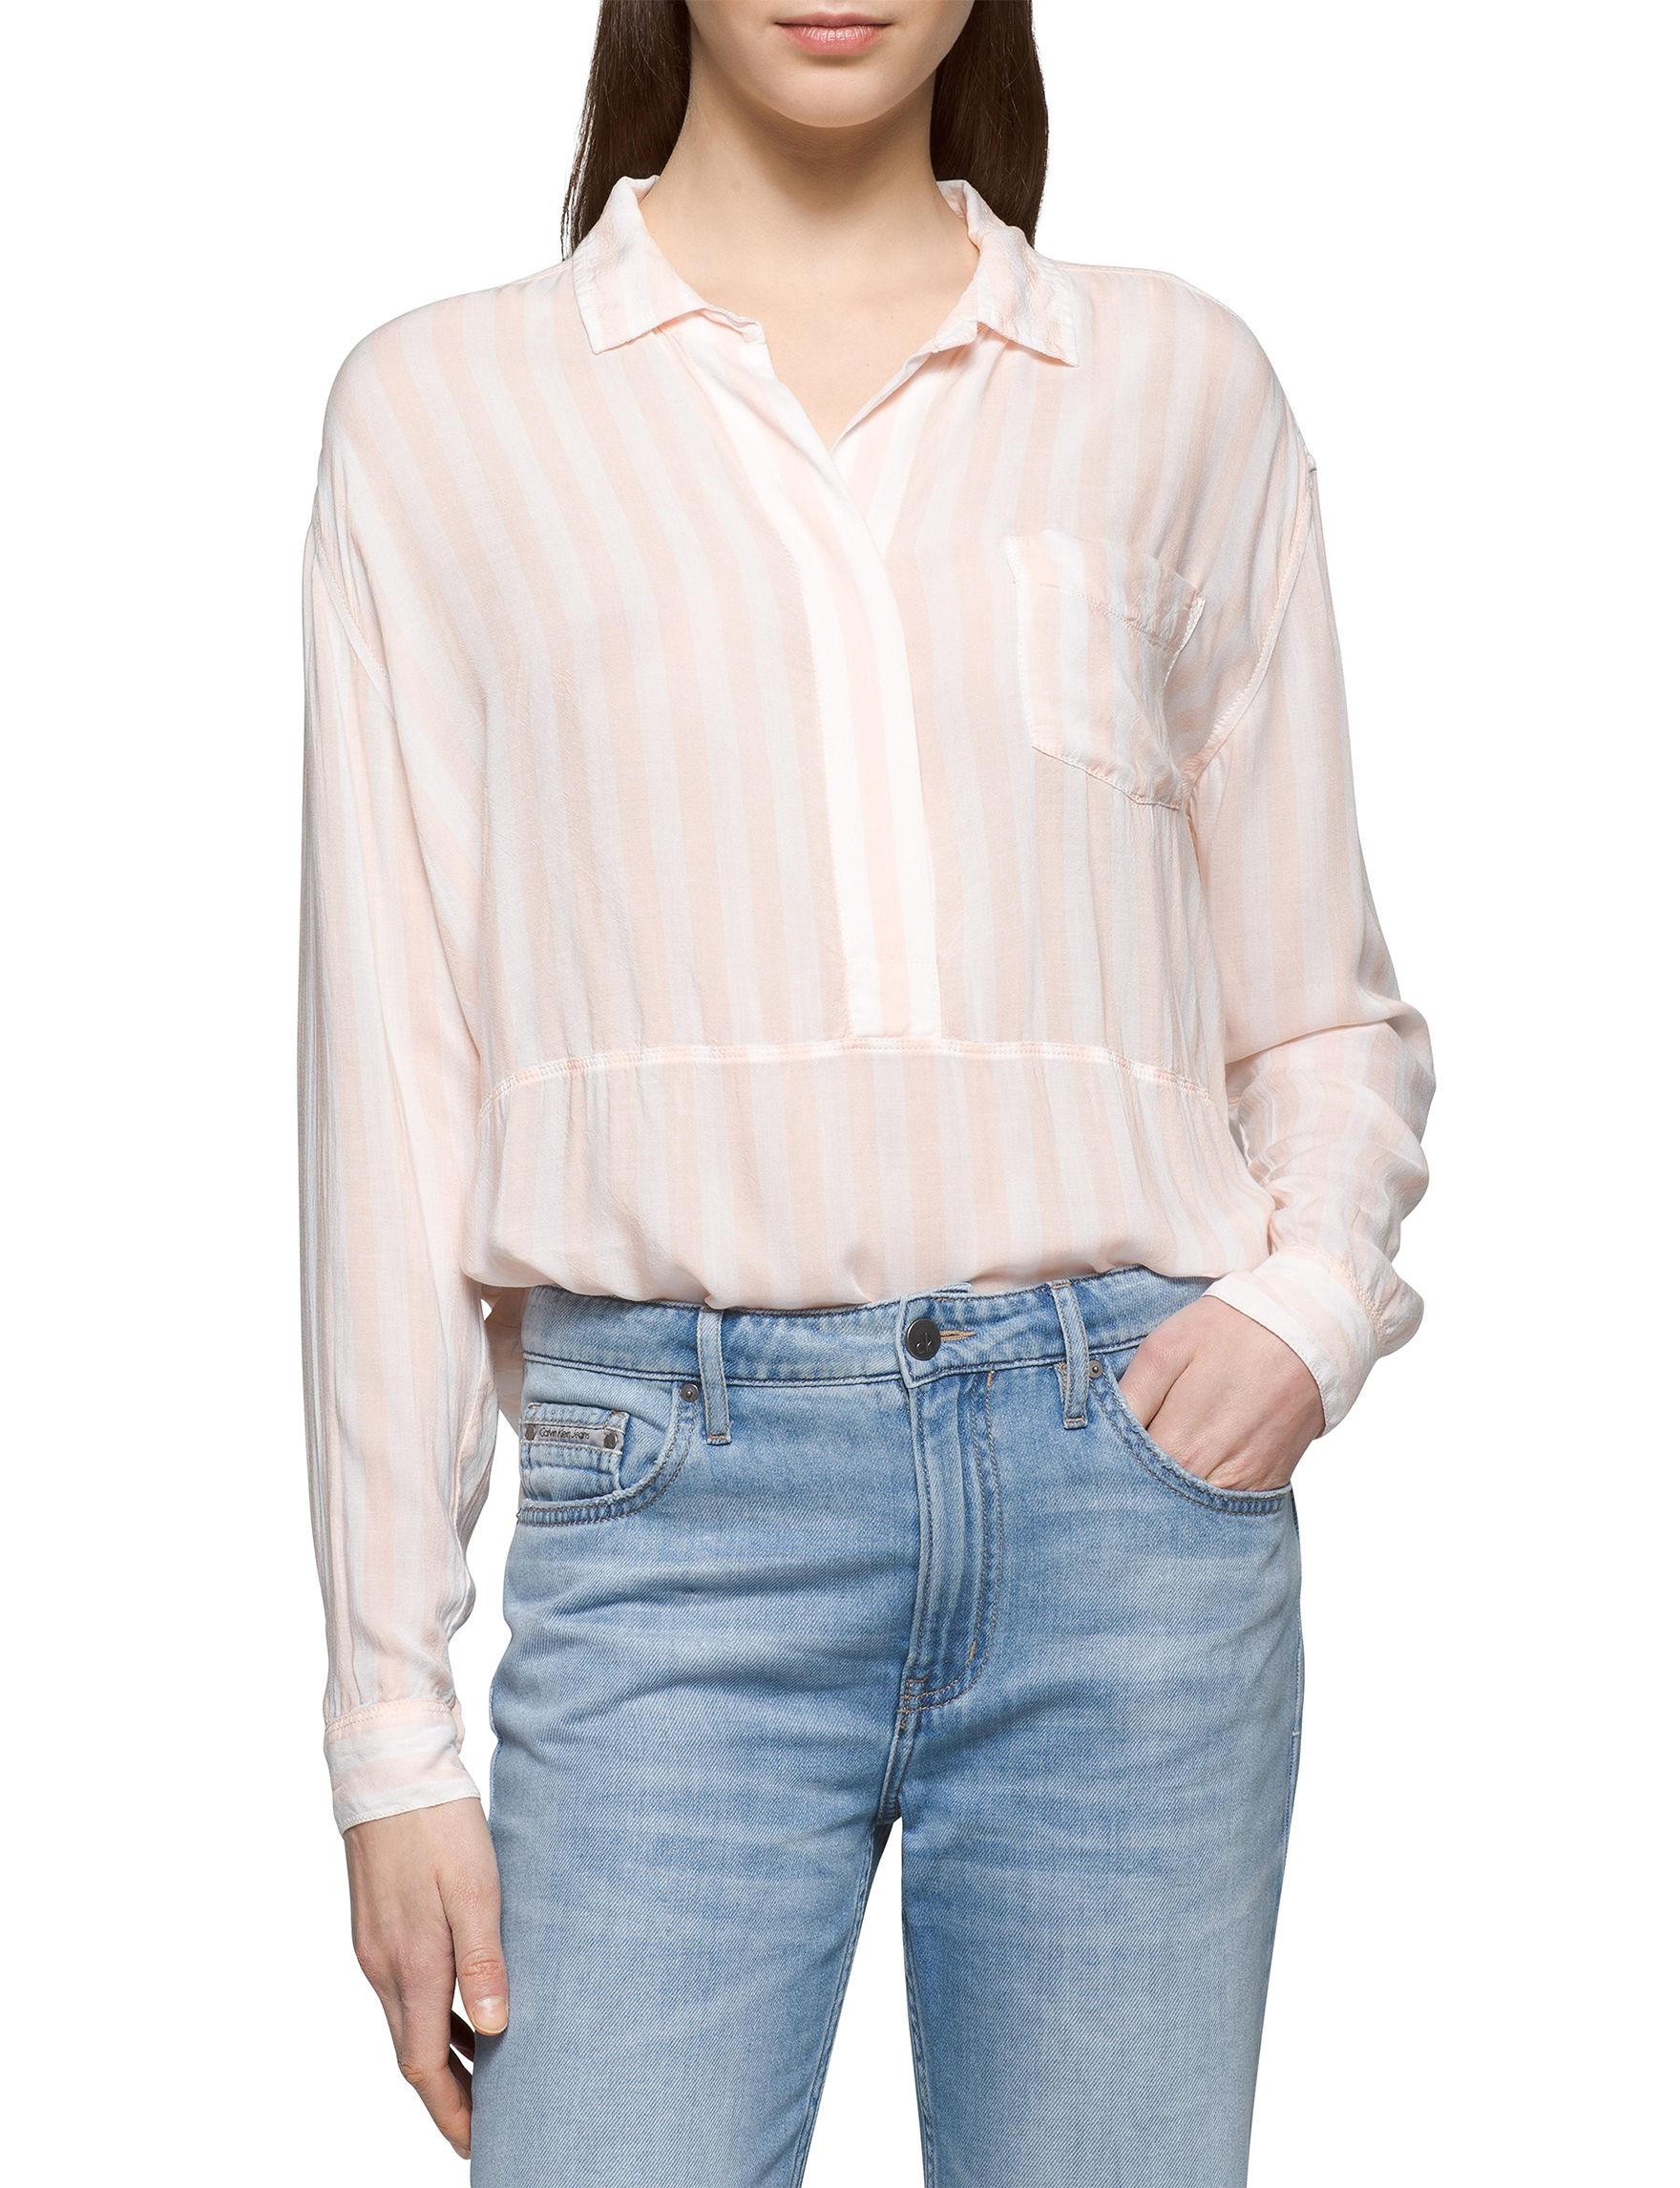 Calvin Klein Jeans Pink Shirts & Blouses